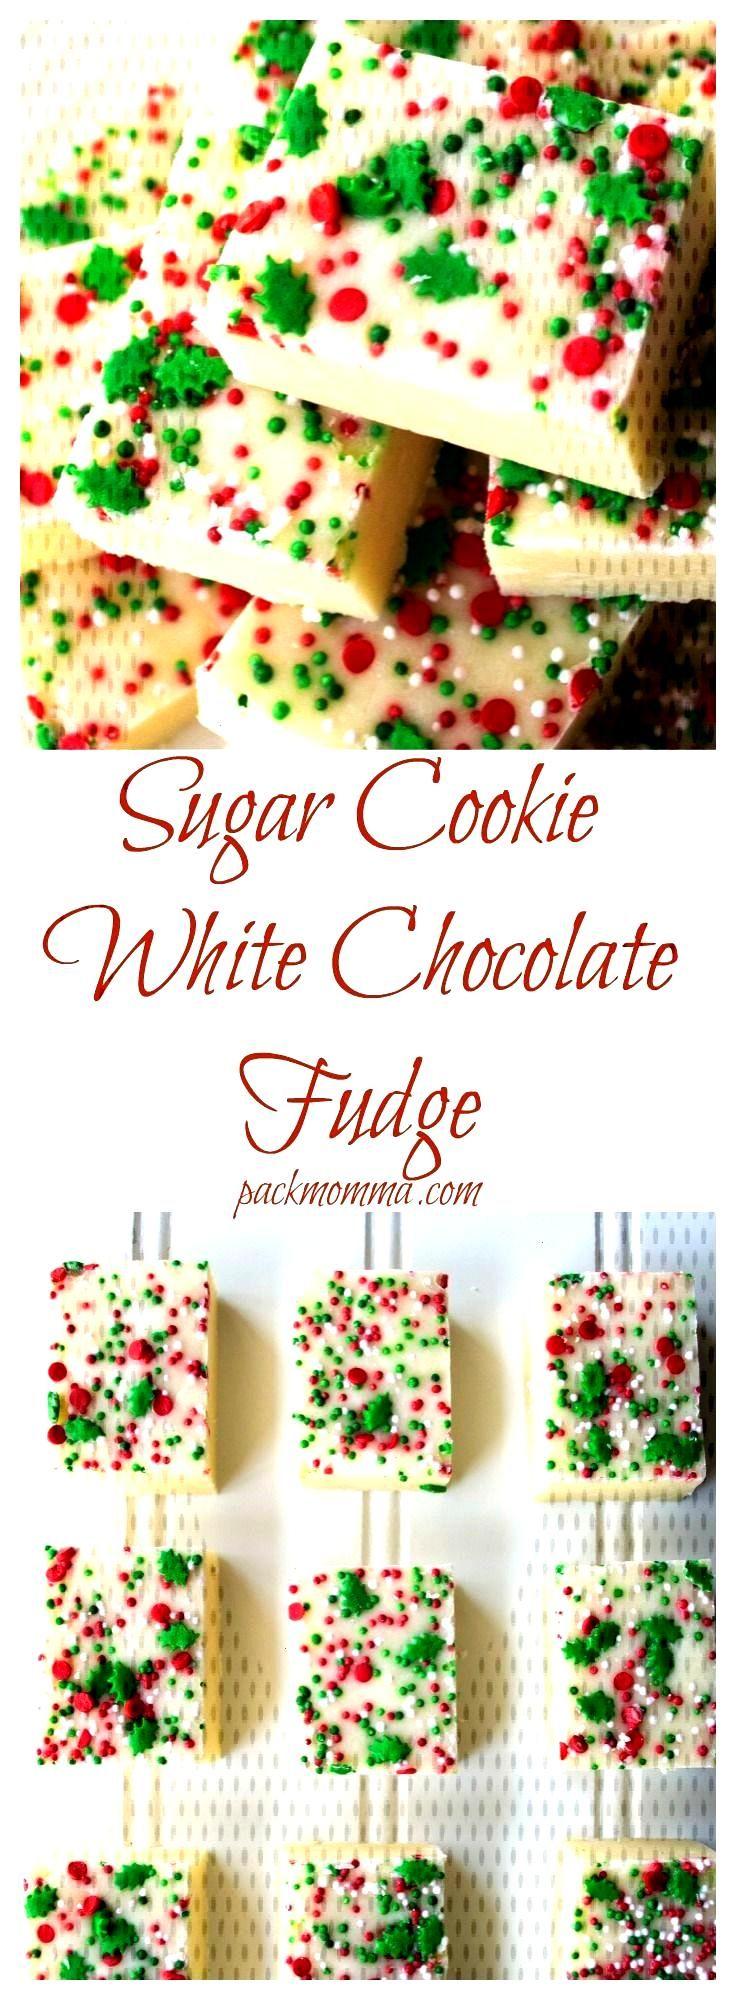 Sugar Cookie White Chocolate Fudge -